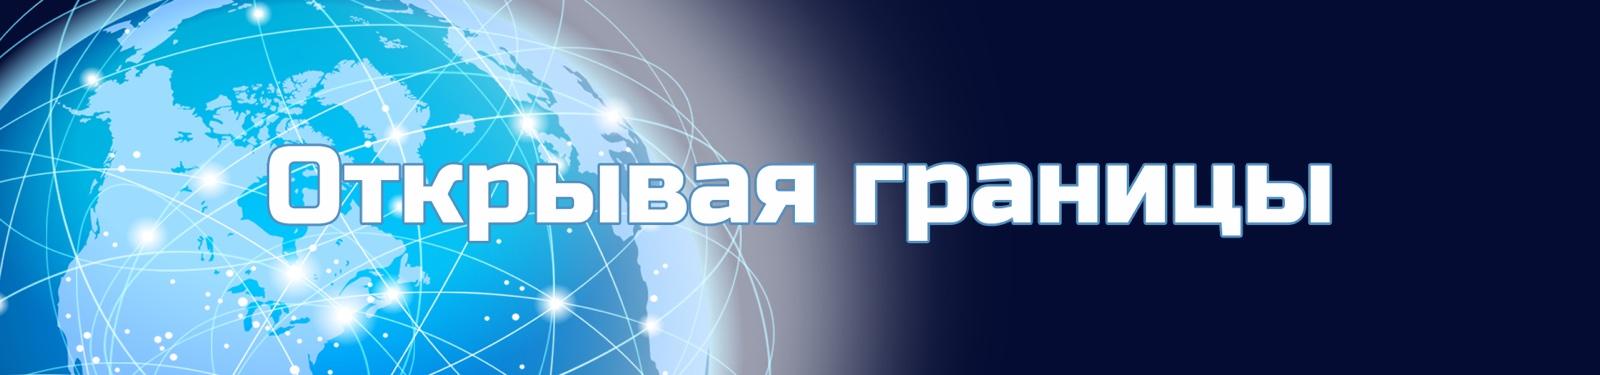 izobrazhenie viber 2021 04 08 16 10 44 - Главная